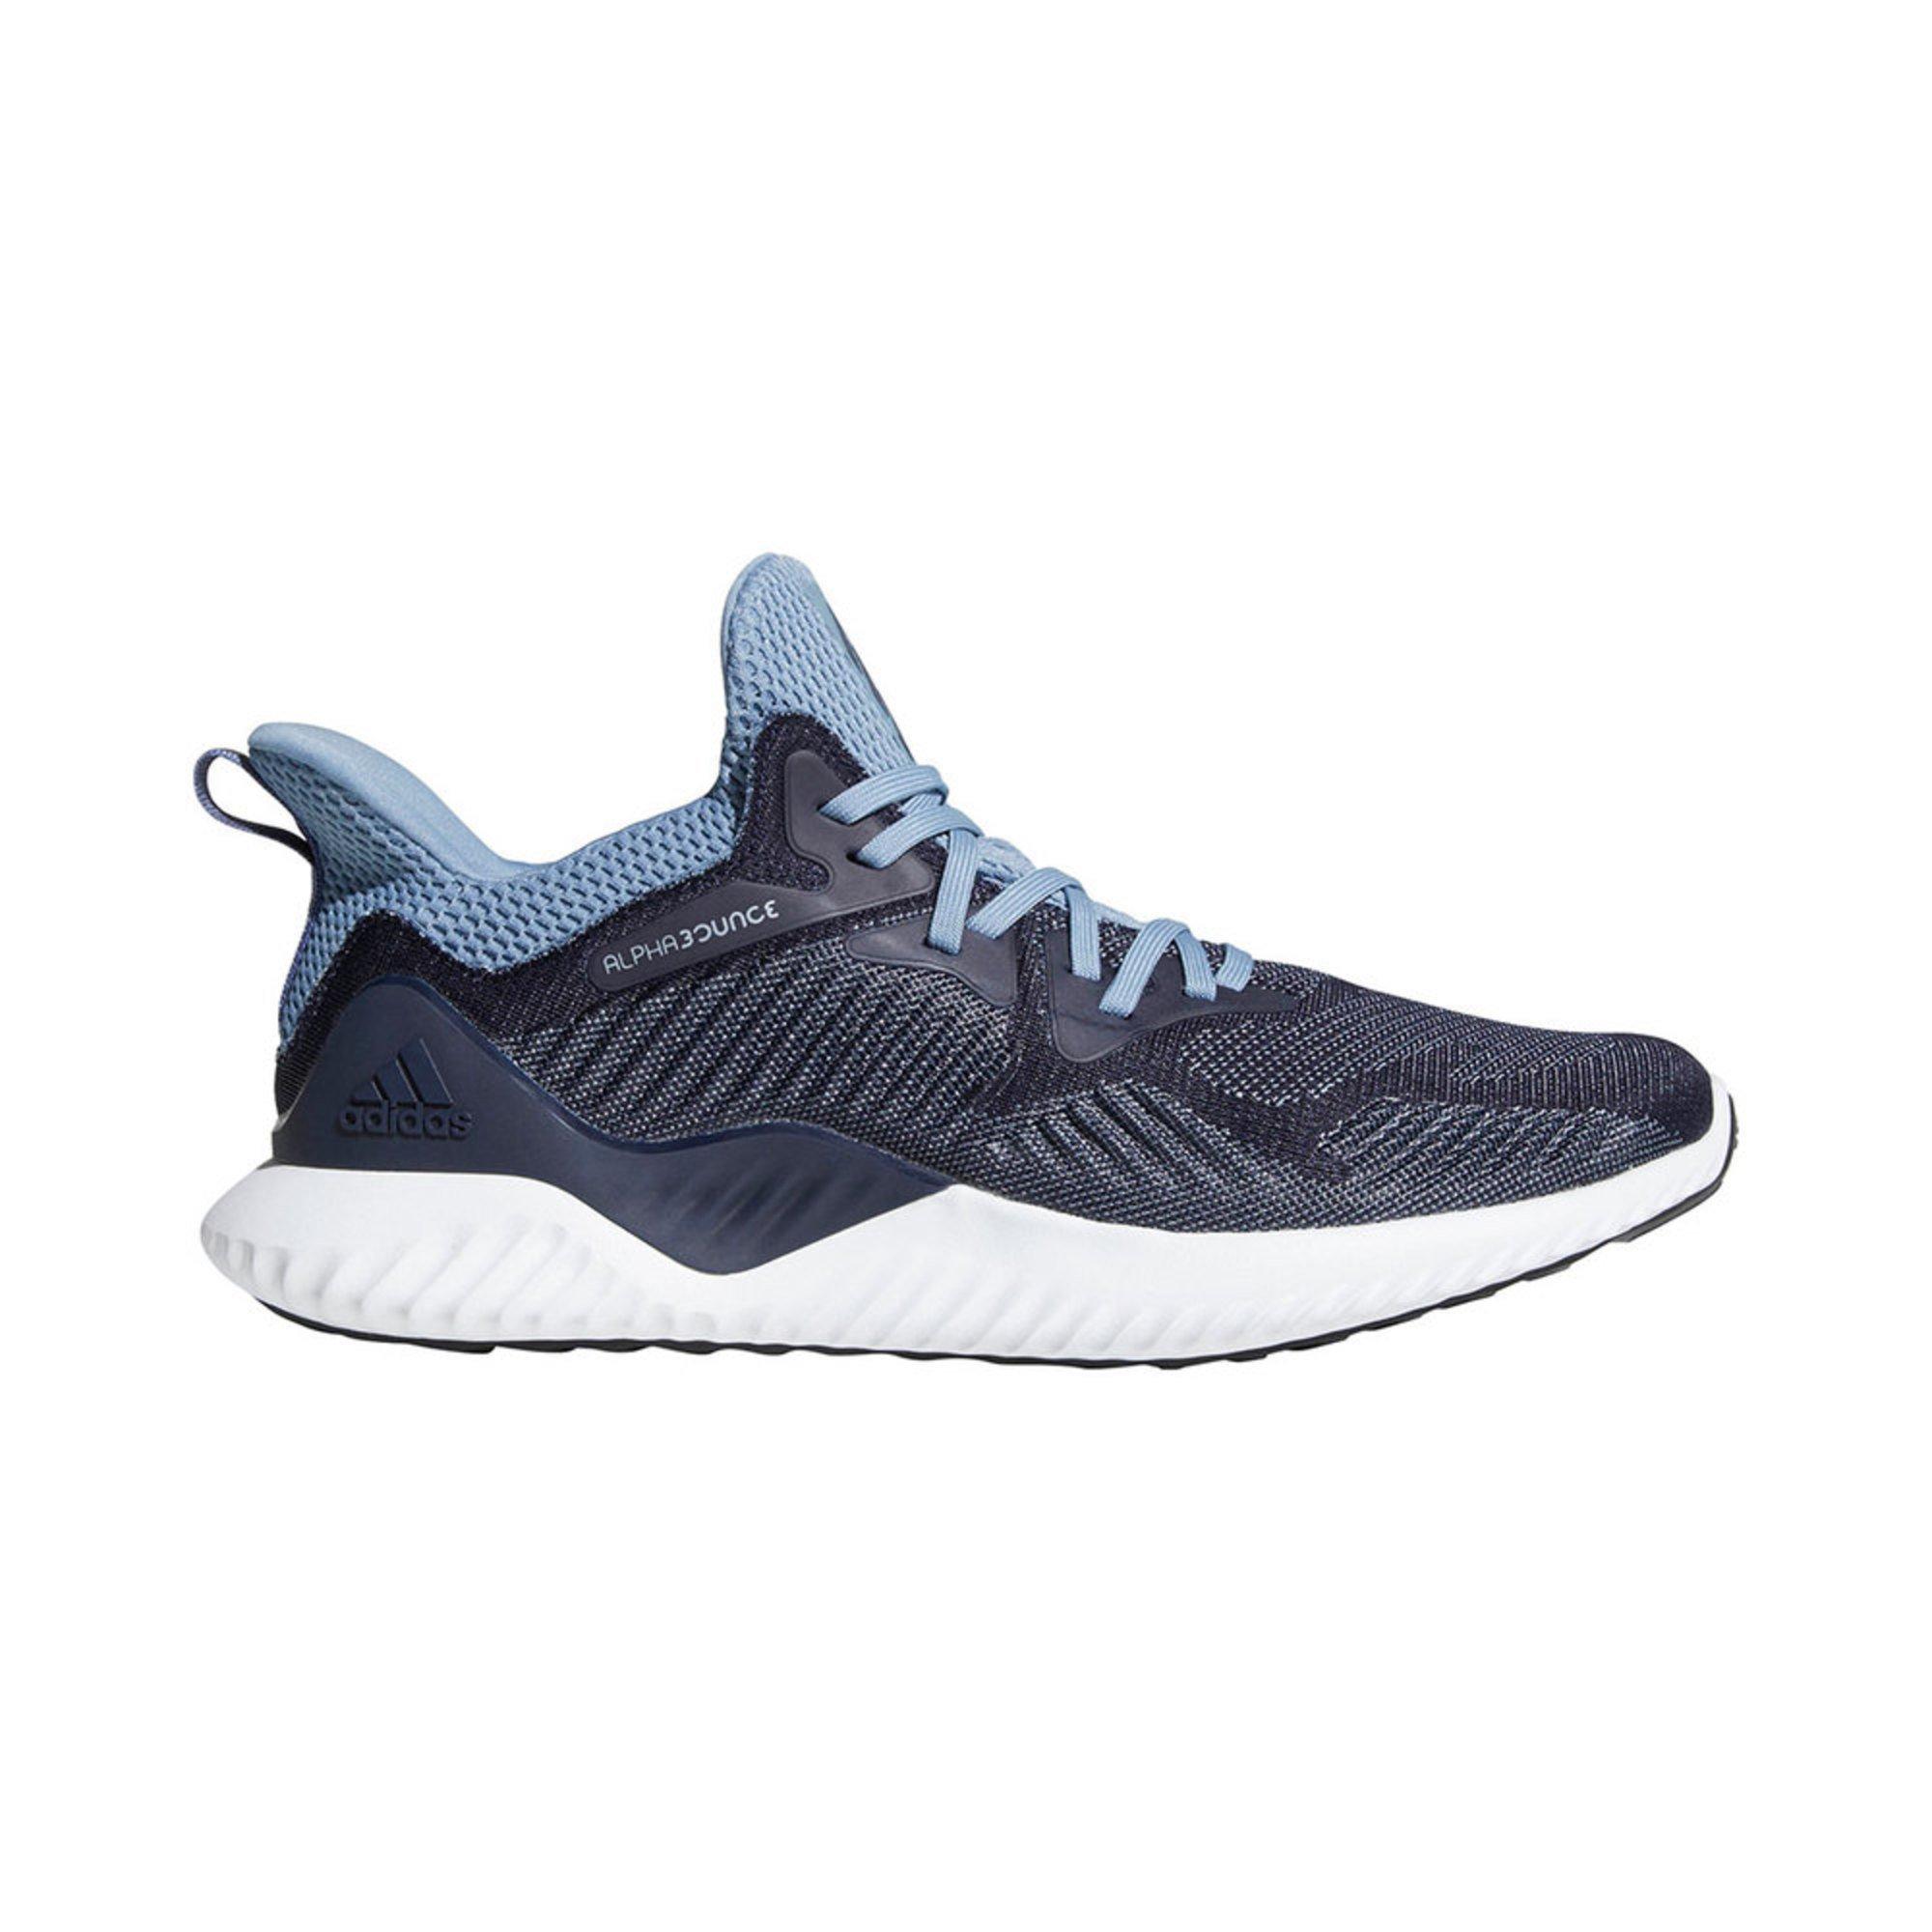 new styles 4a436 ae772 Adidas Mens Alphabounce Beyond Running Shoe  Mens Running Sh